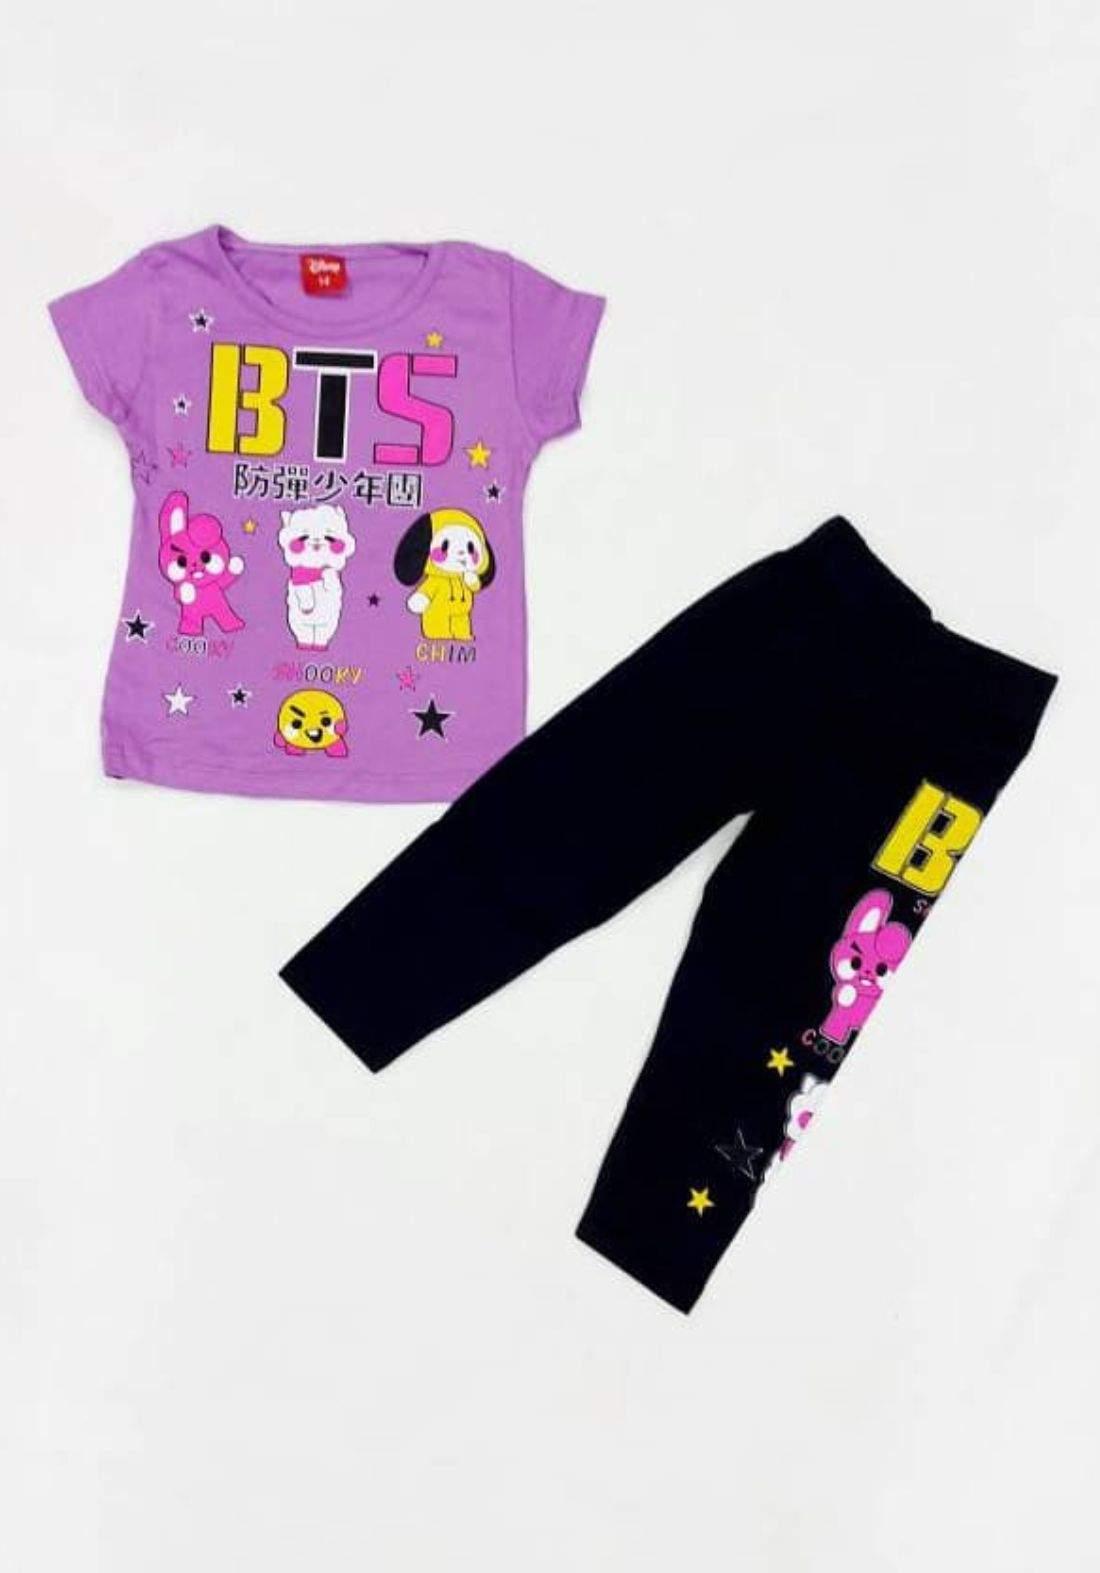 Tracksuit for girls Purpl  (t-shirt+pijamas) تراكسوت بناتي بنفسجي (بجامة+تيشيرت)